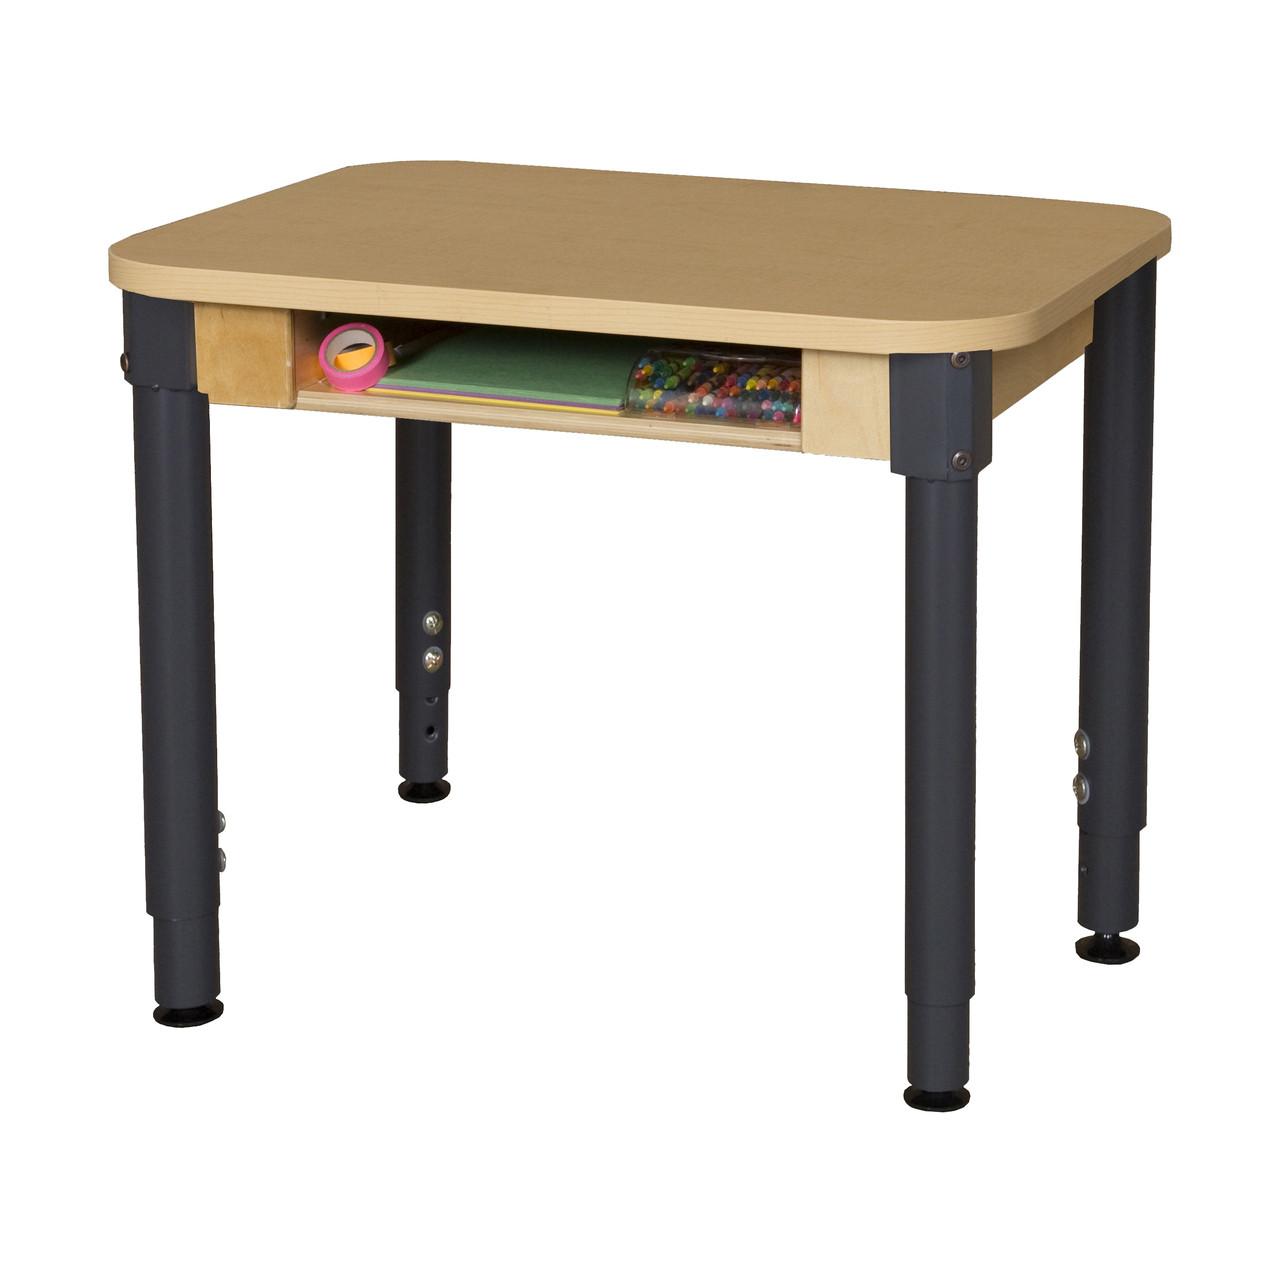 Wood Designs Wdhpl1824dska1829 High Pressure Laminate Student Desk With 18 To 29 Inch Legs